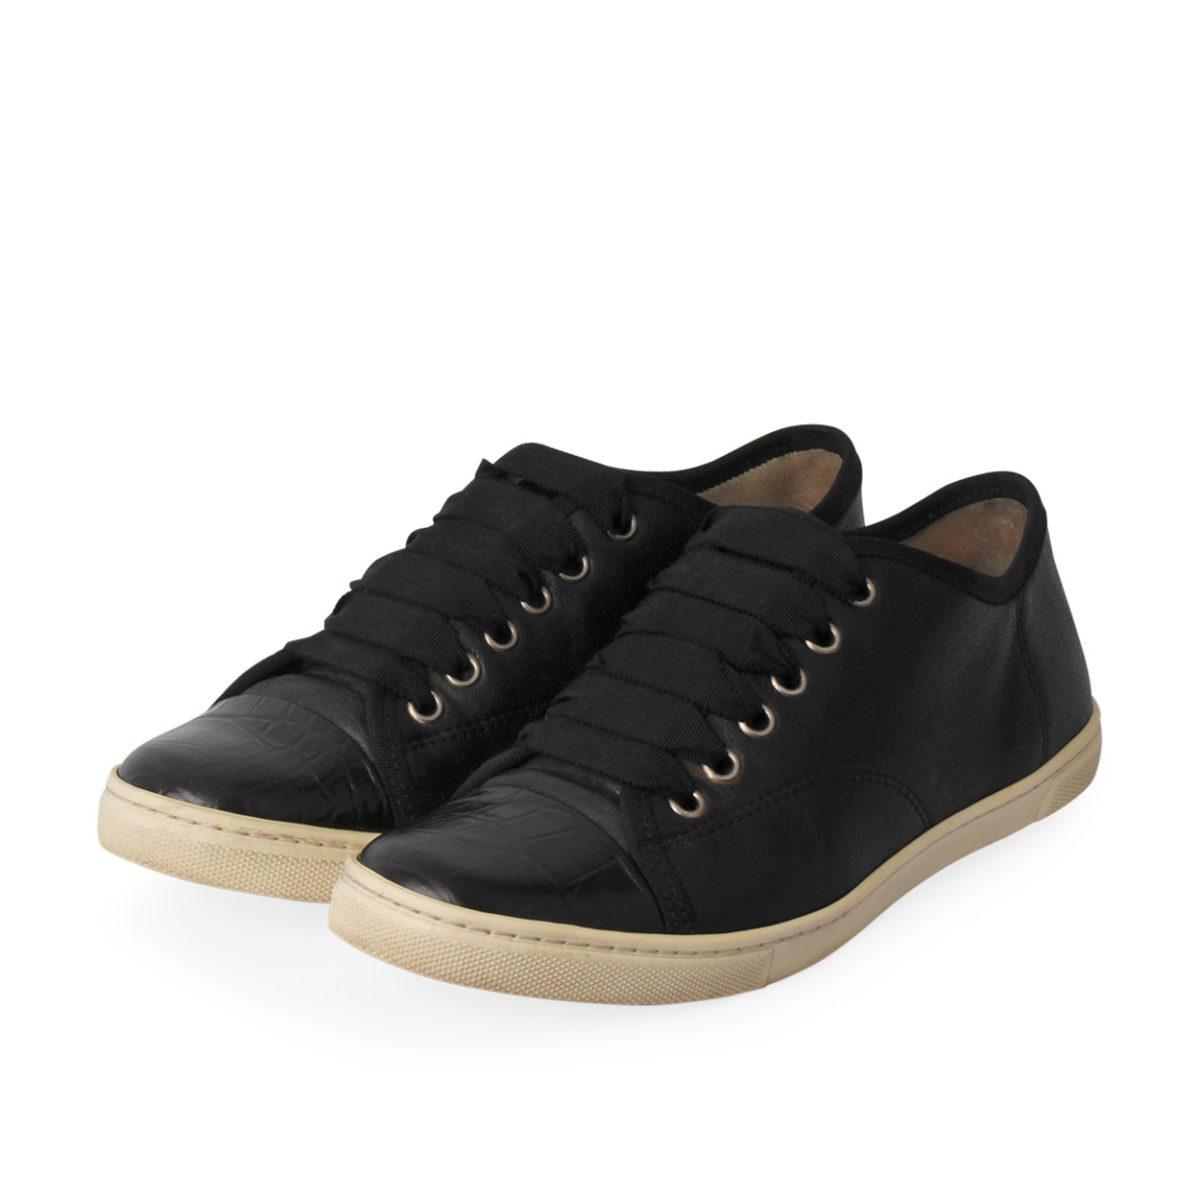 lanvin sneakers black